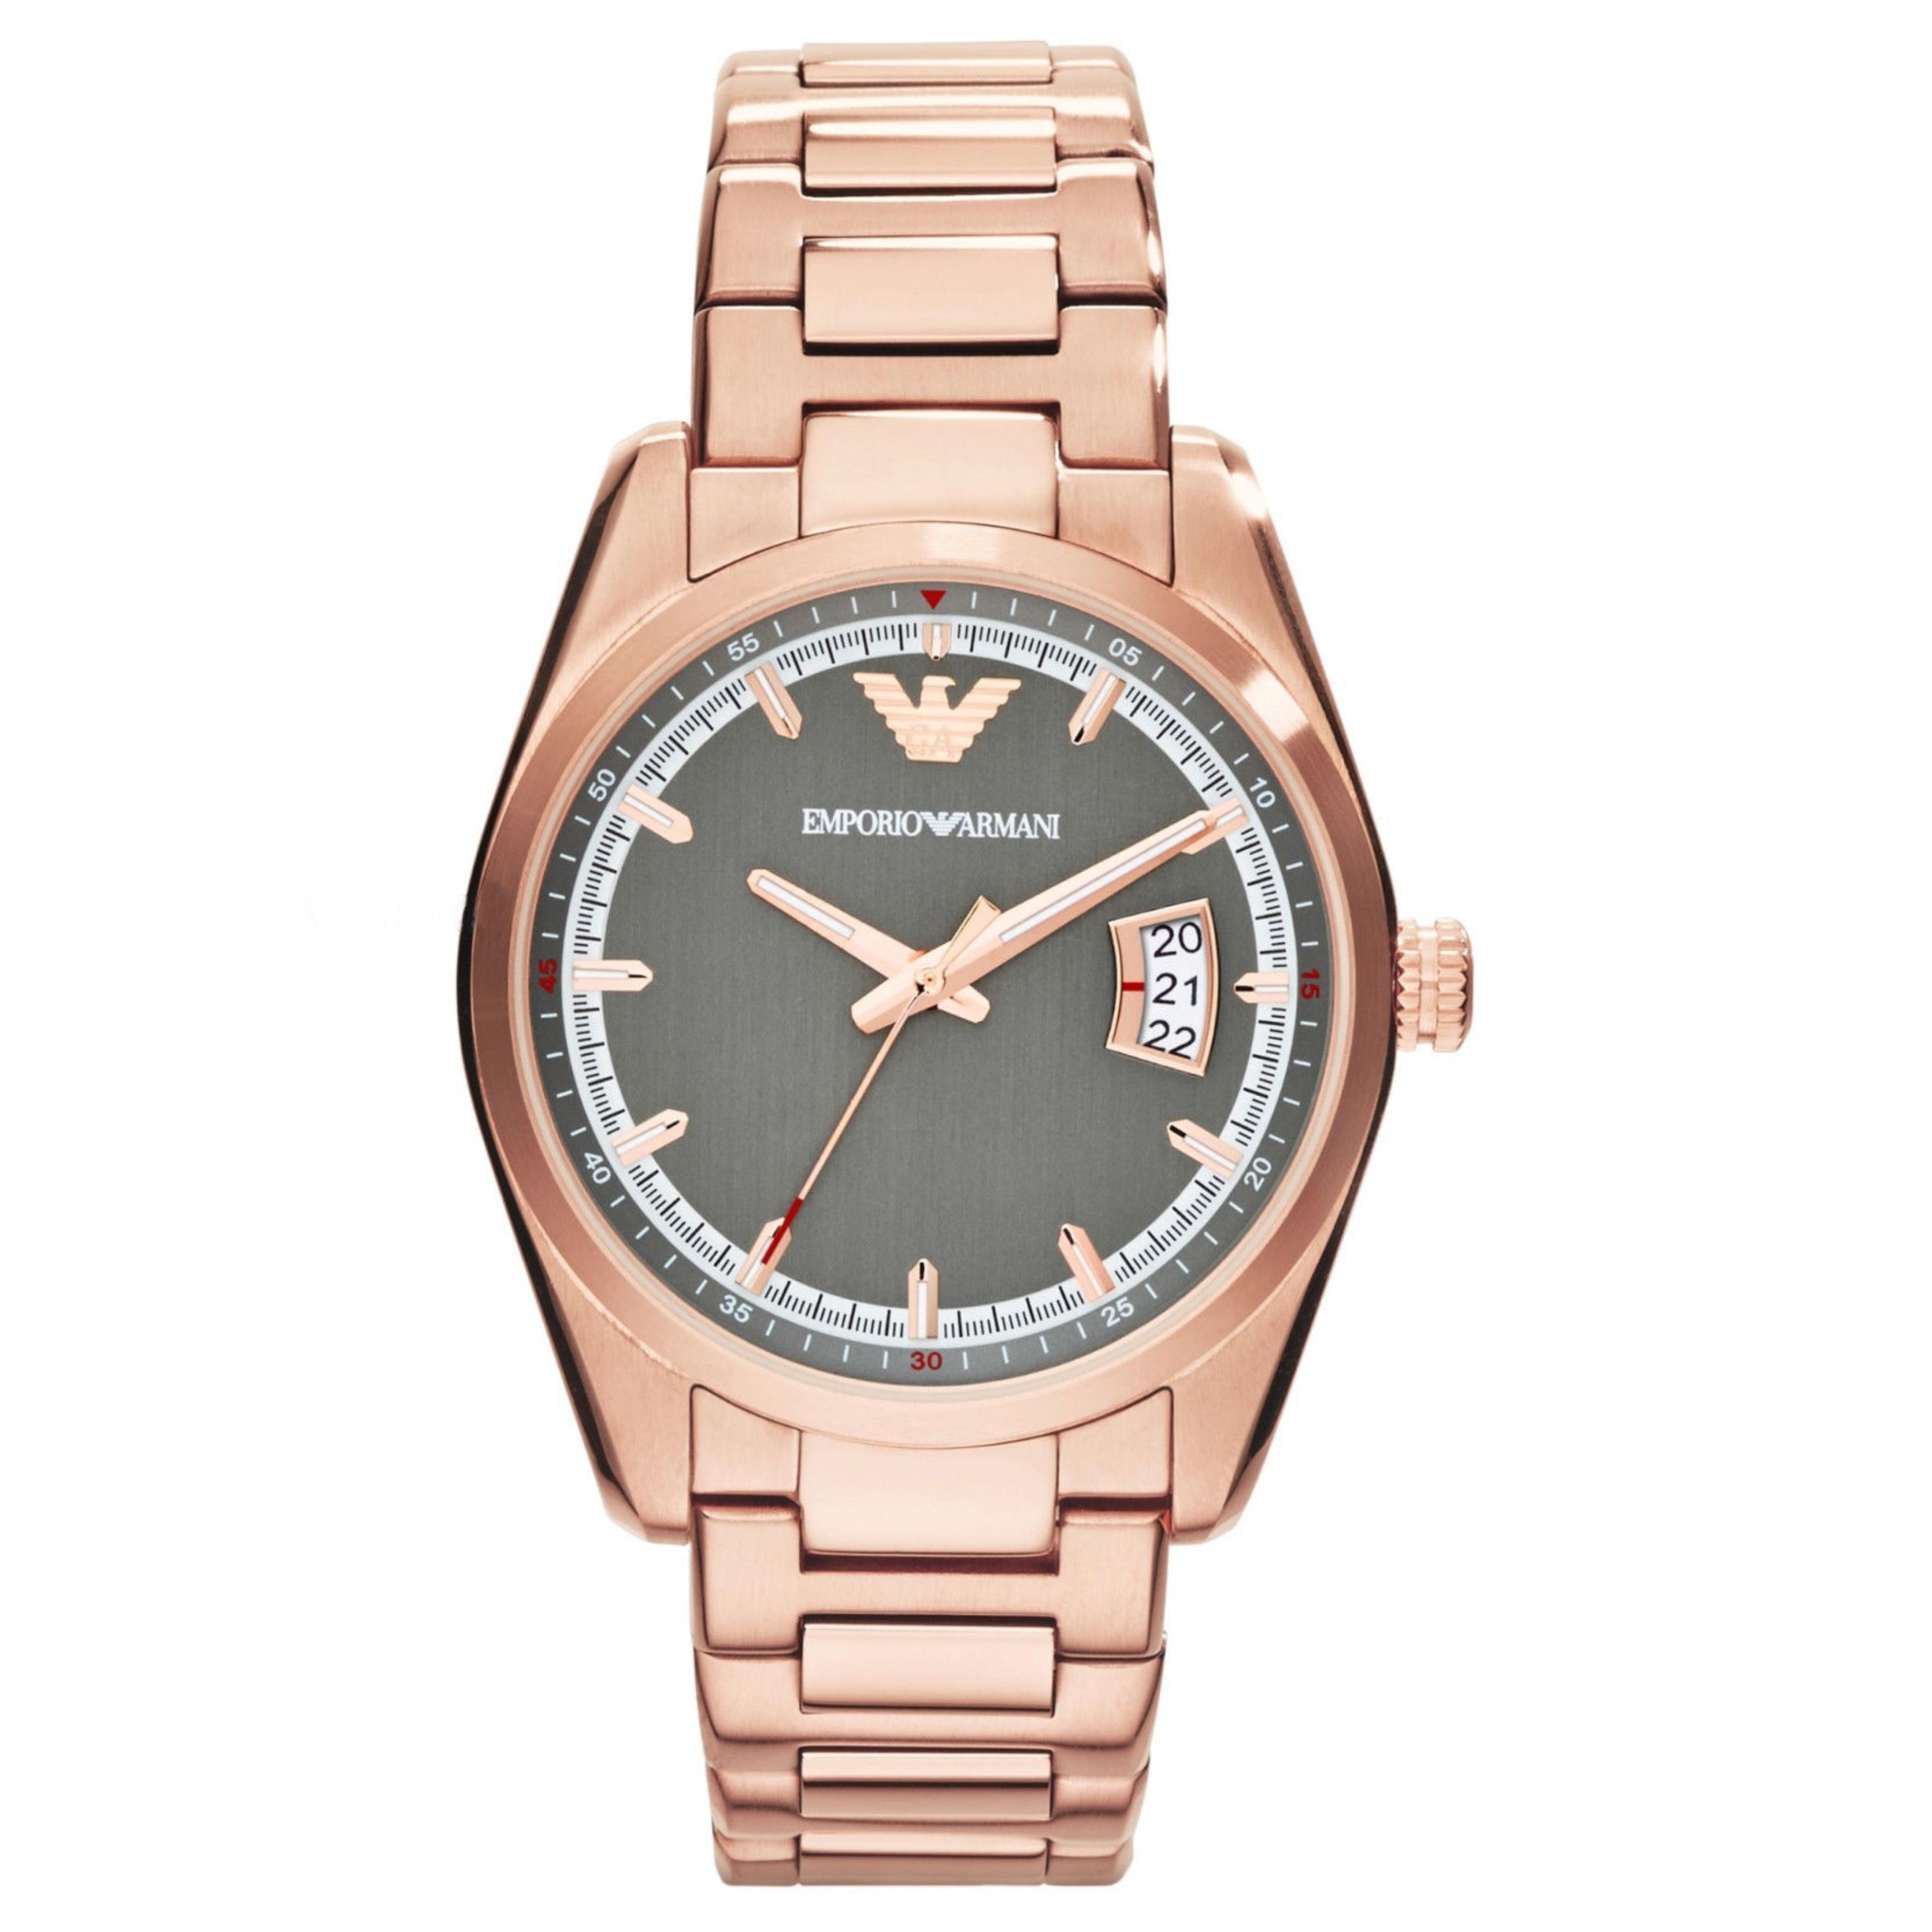 Emporio Armani Sportivo Ladies Watch | Grey Dial | PVD Rose Plated Strap | AR6020